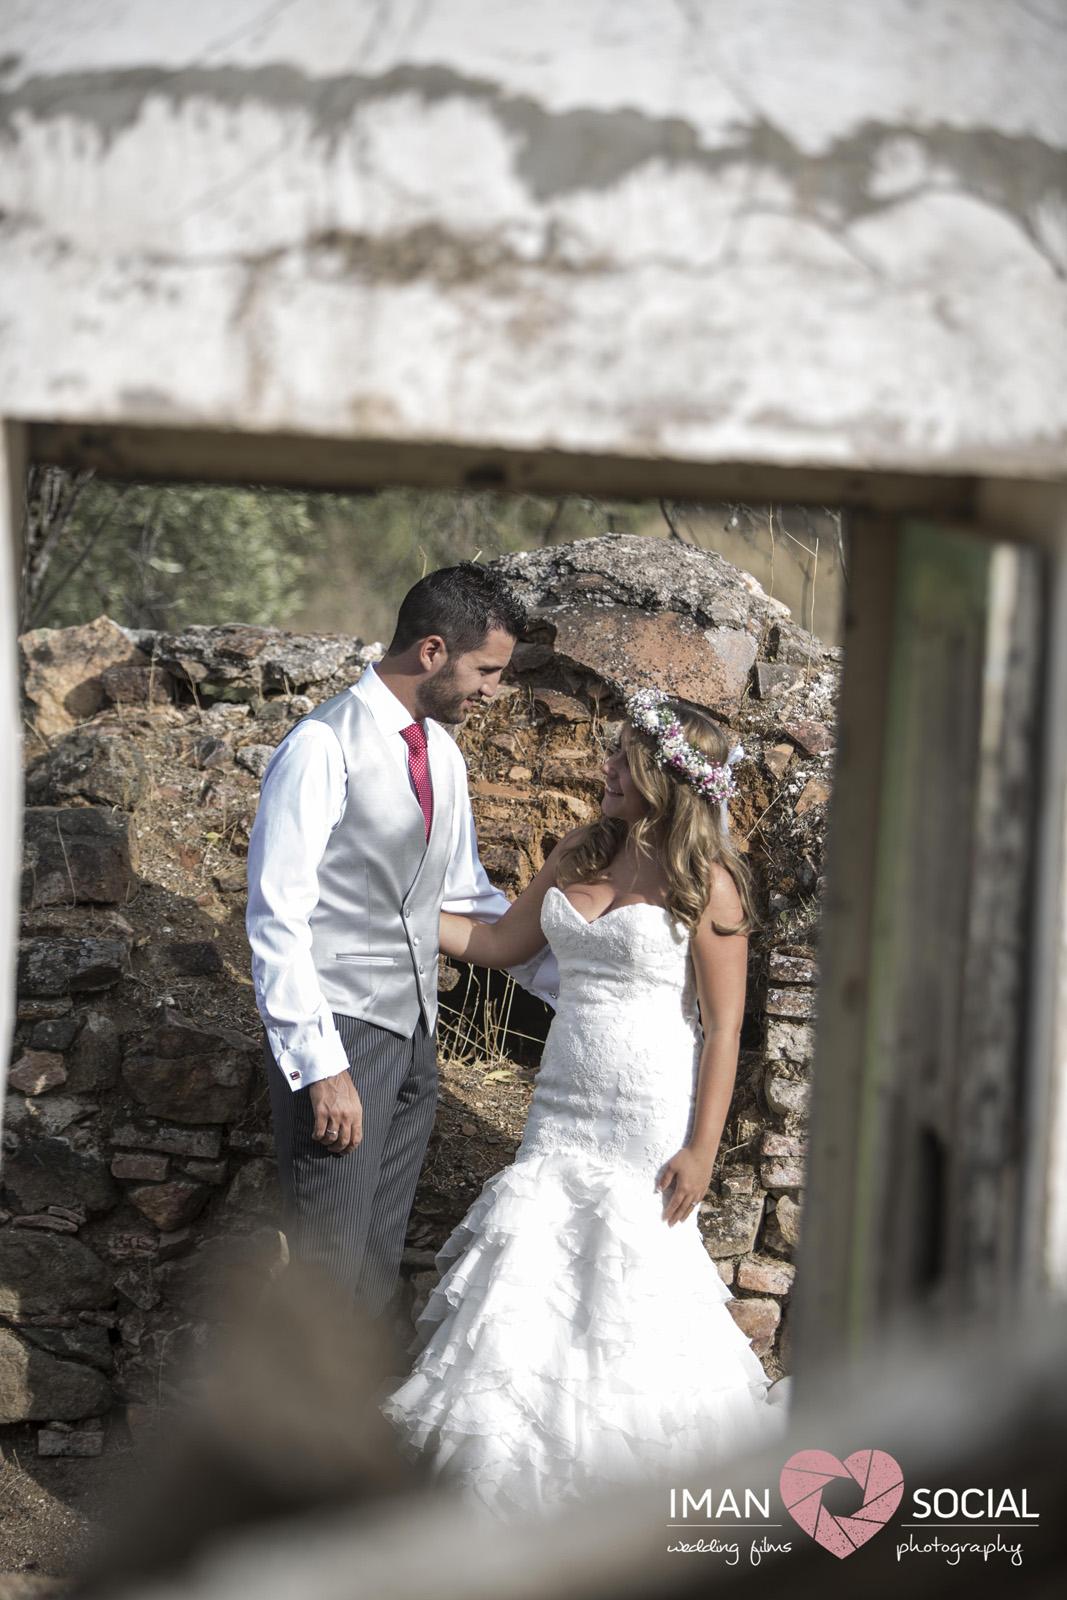 77B0111 Juan Antonio y Mónica - Postboda - video boda cordoba